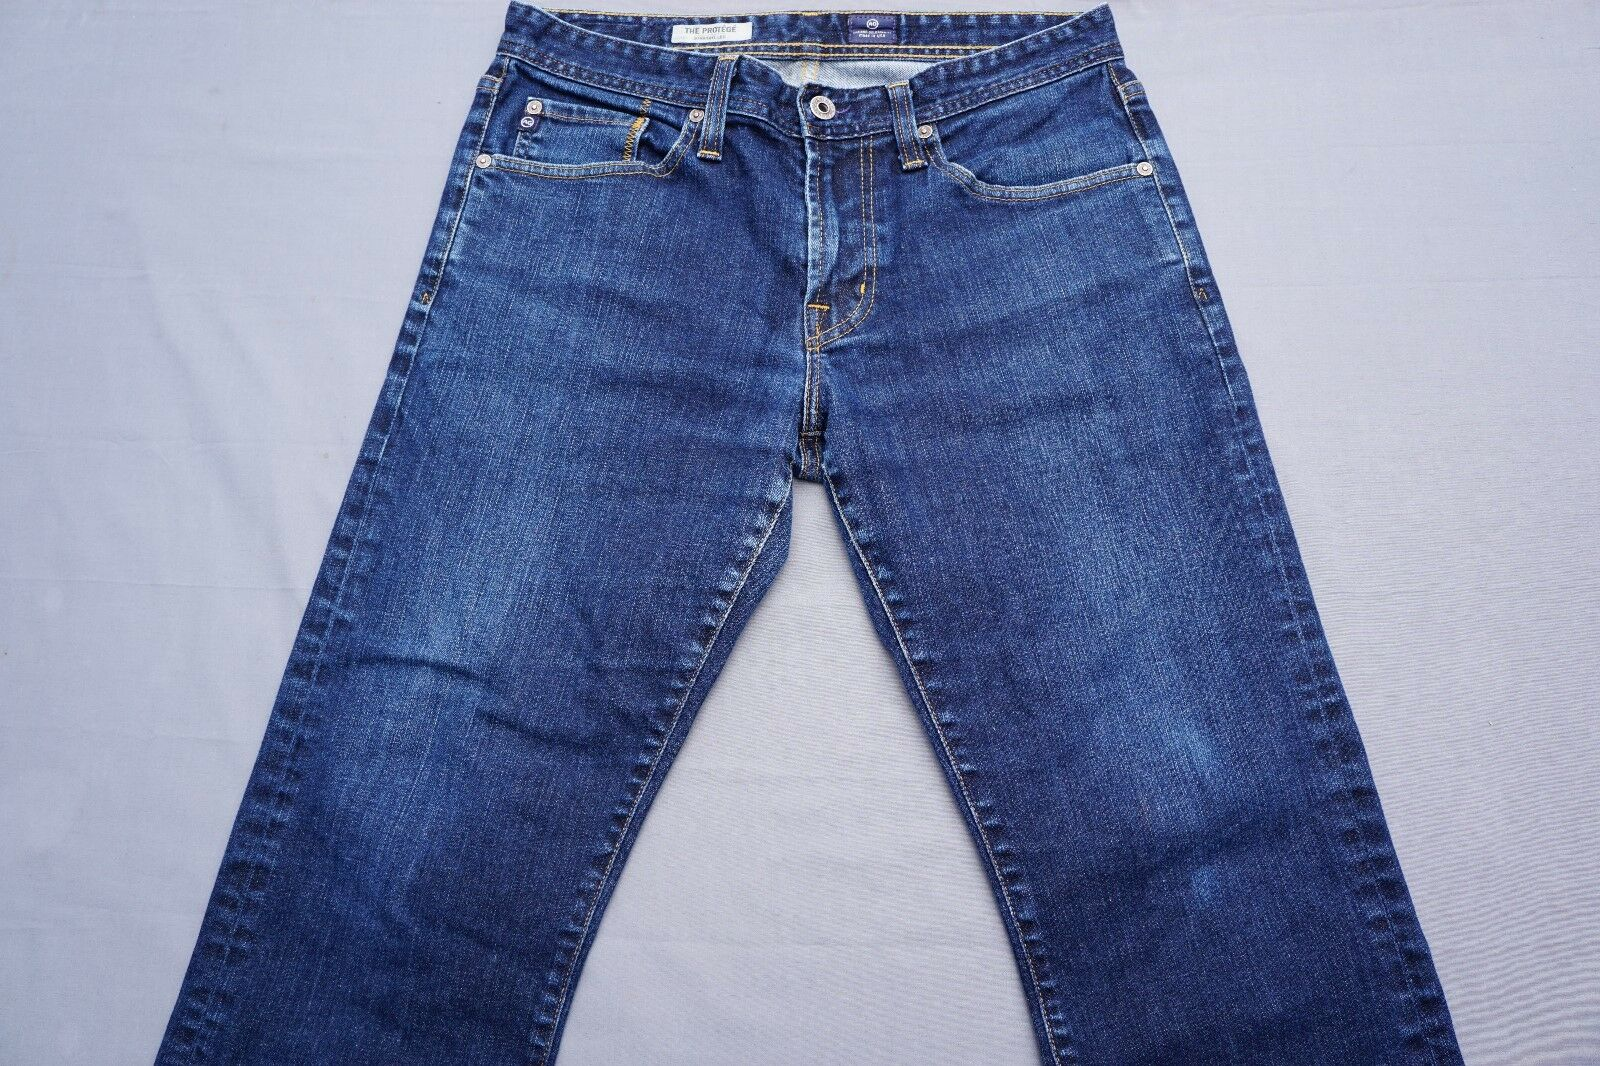 AG Adriano goldschmied The Predege Men's Jeans Straight Leg Stretch Size 31x28